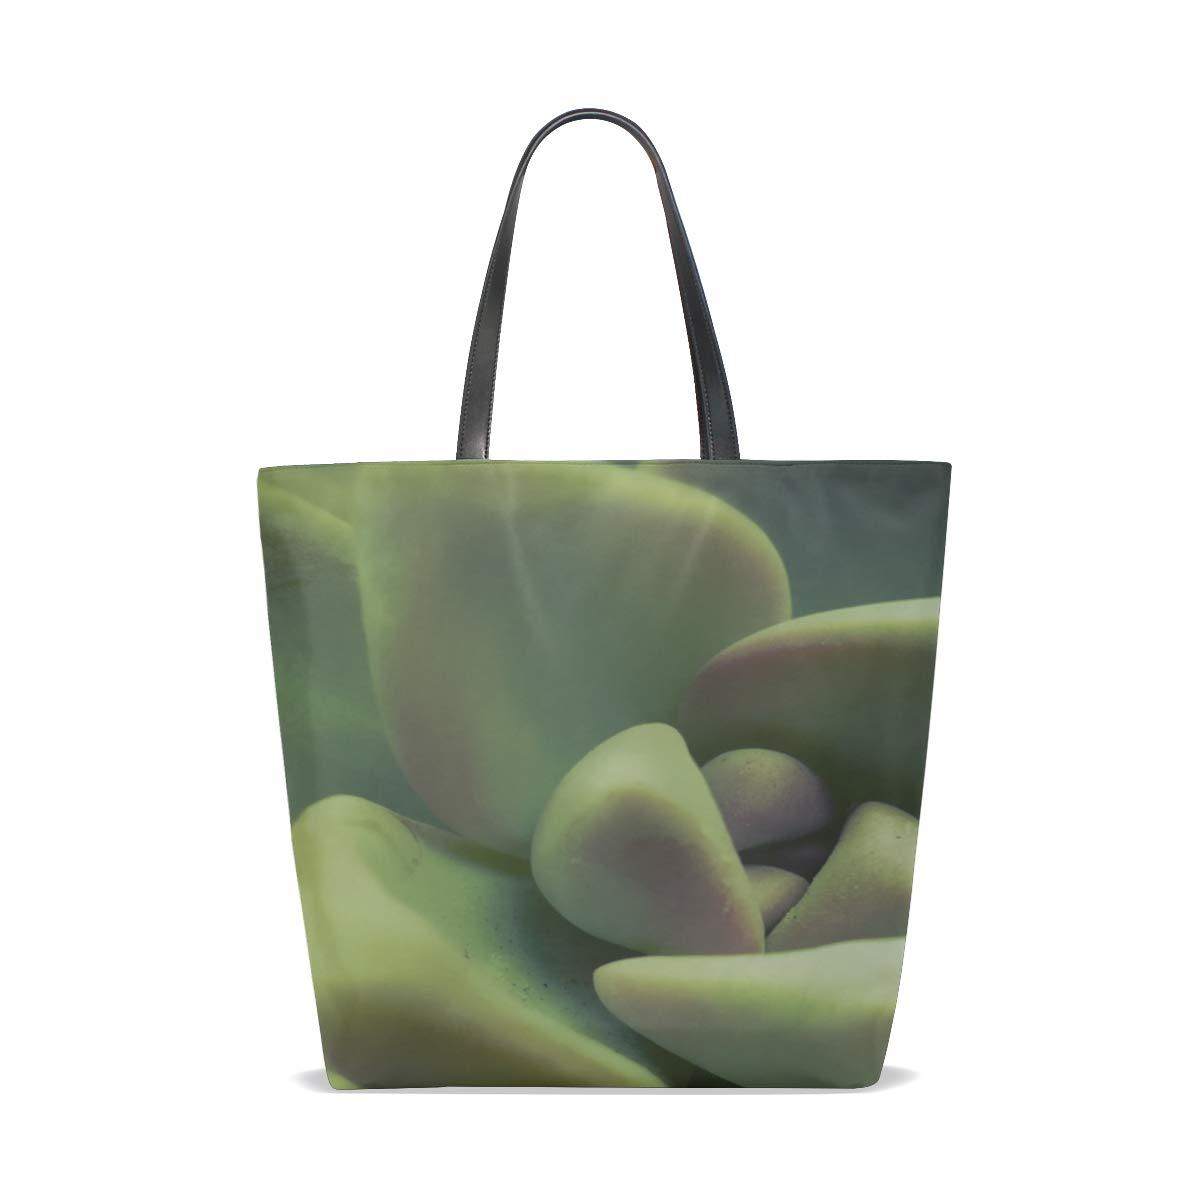 9a59760c18 Amazon.com  Rh Studio Tote Bag Plant Green Leaves Purse Handbag For Women  Girls  Shoes